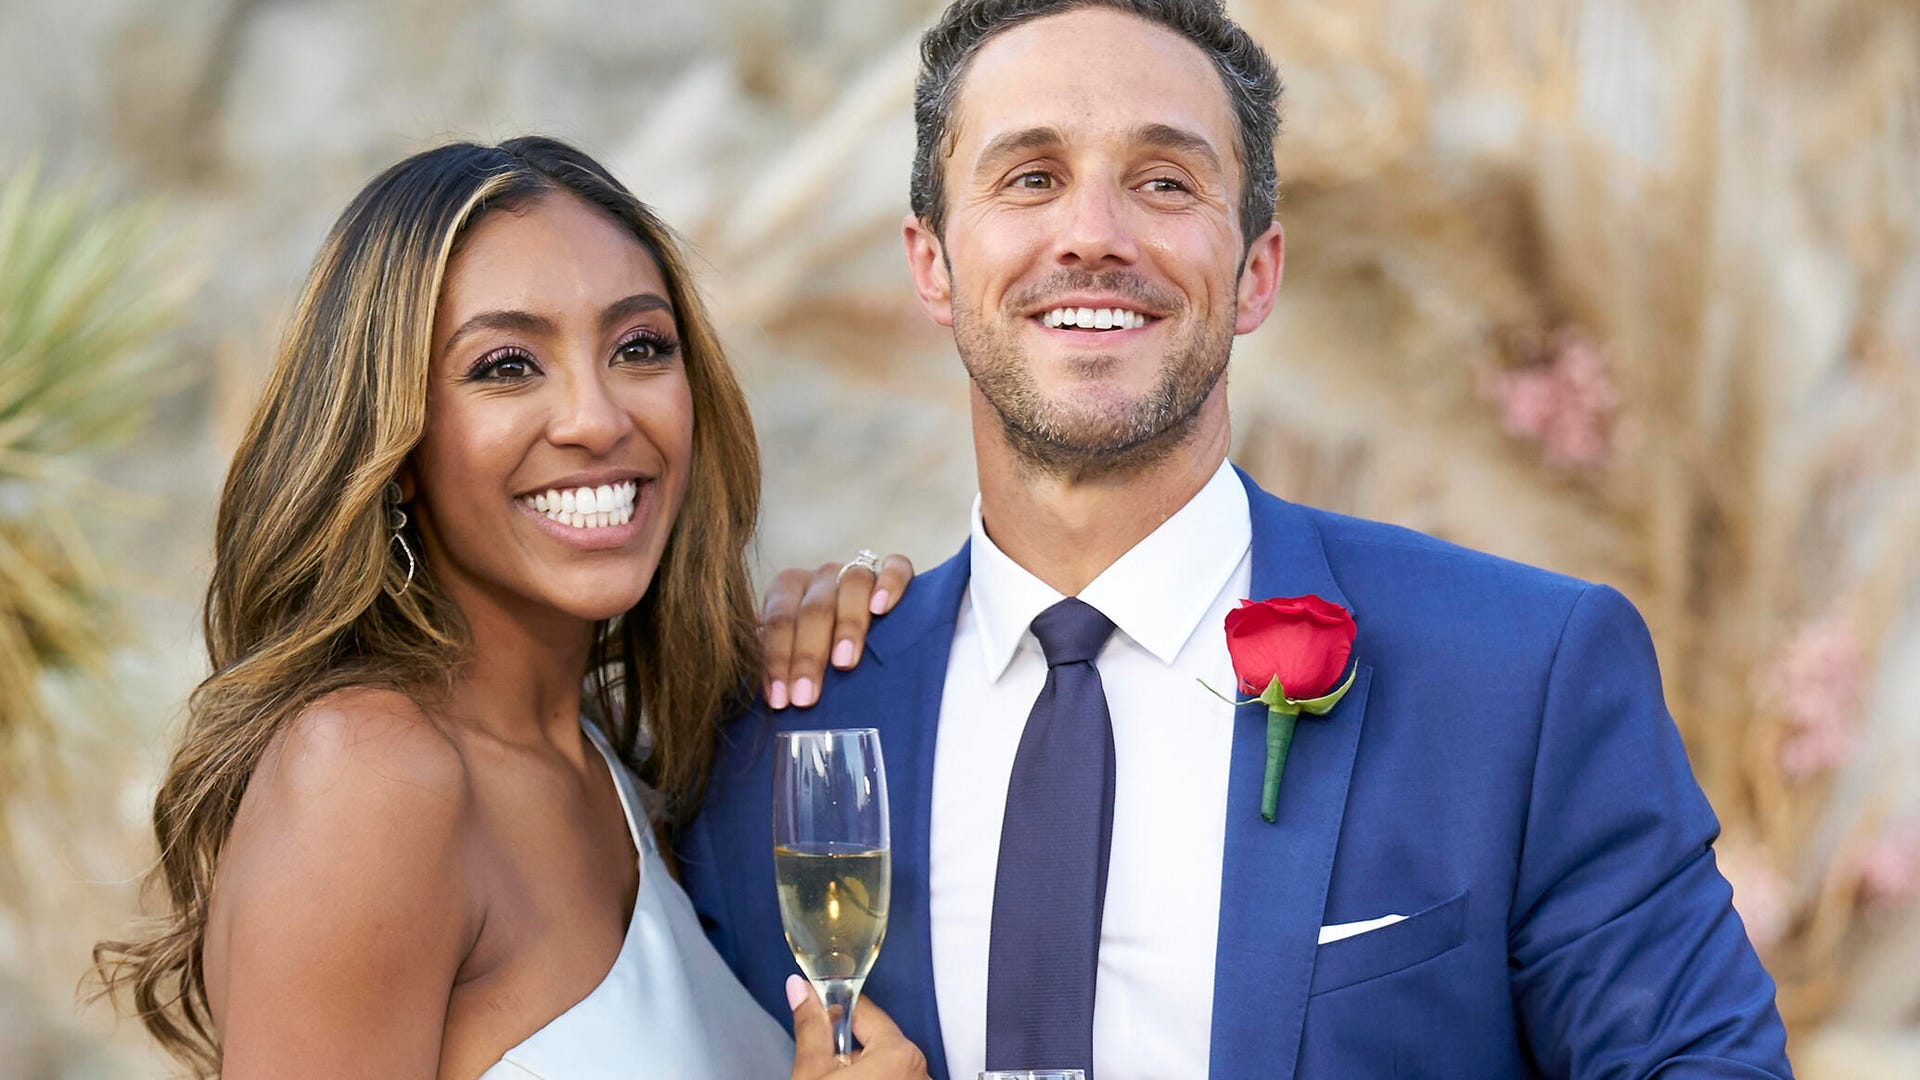 Tayshia Adams and Zac Clark, The Bachelorette